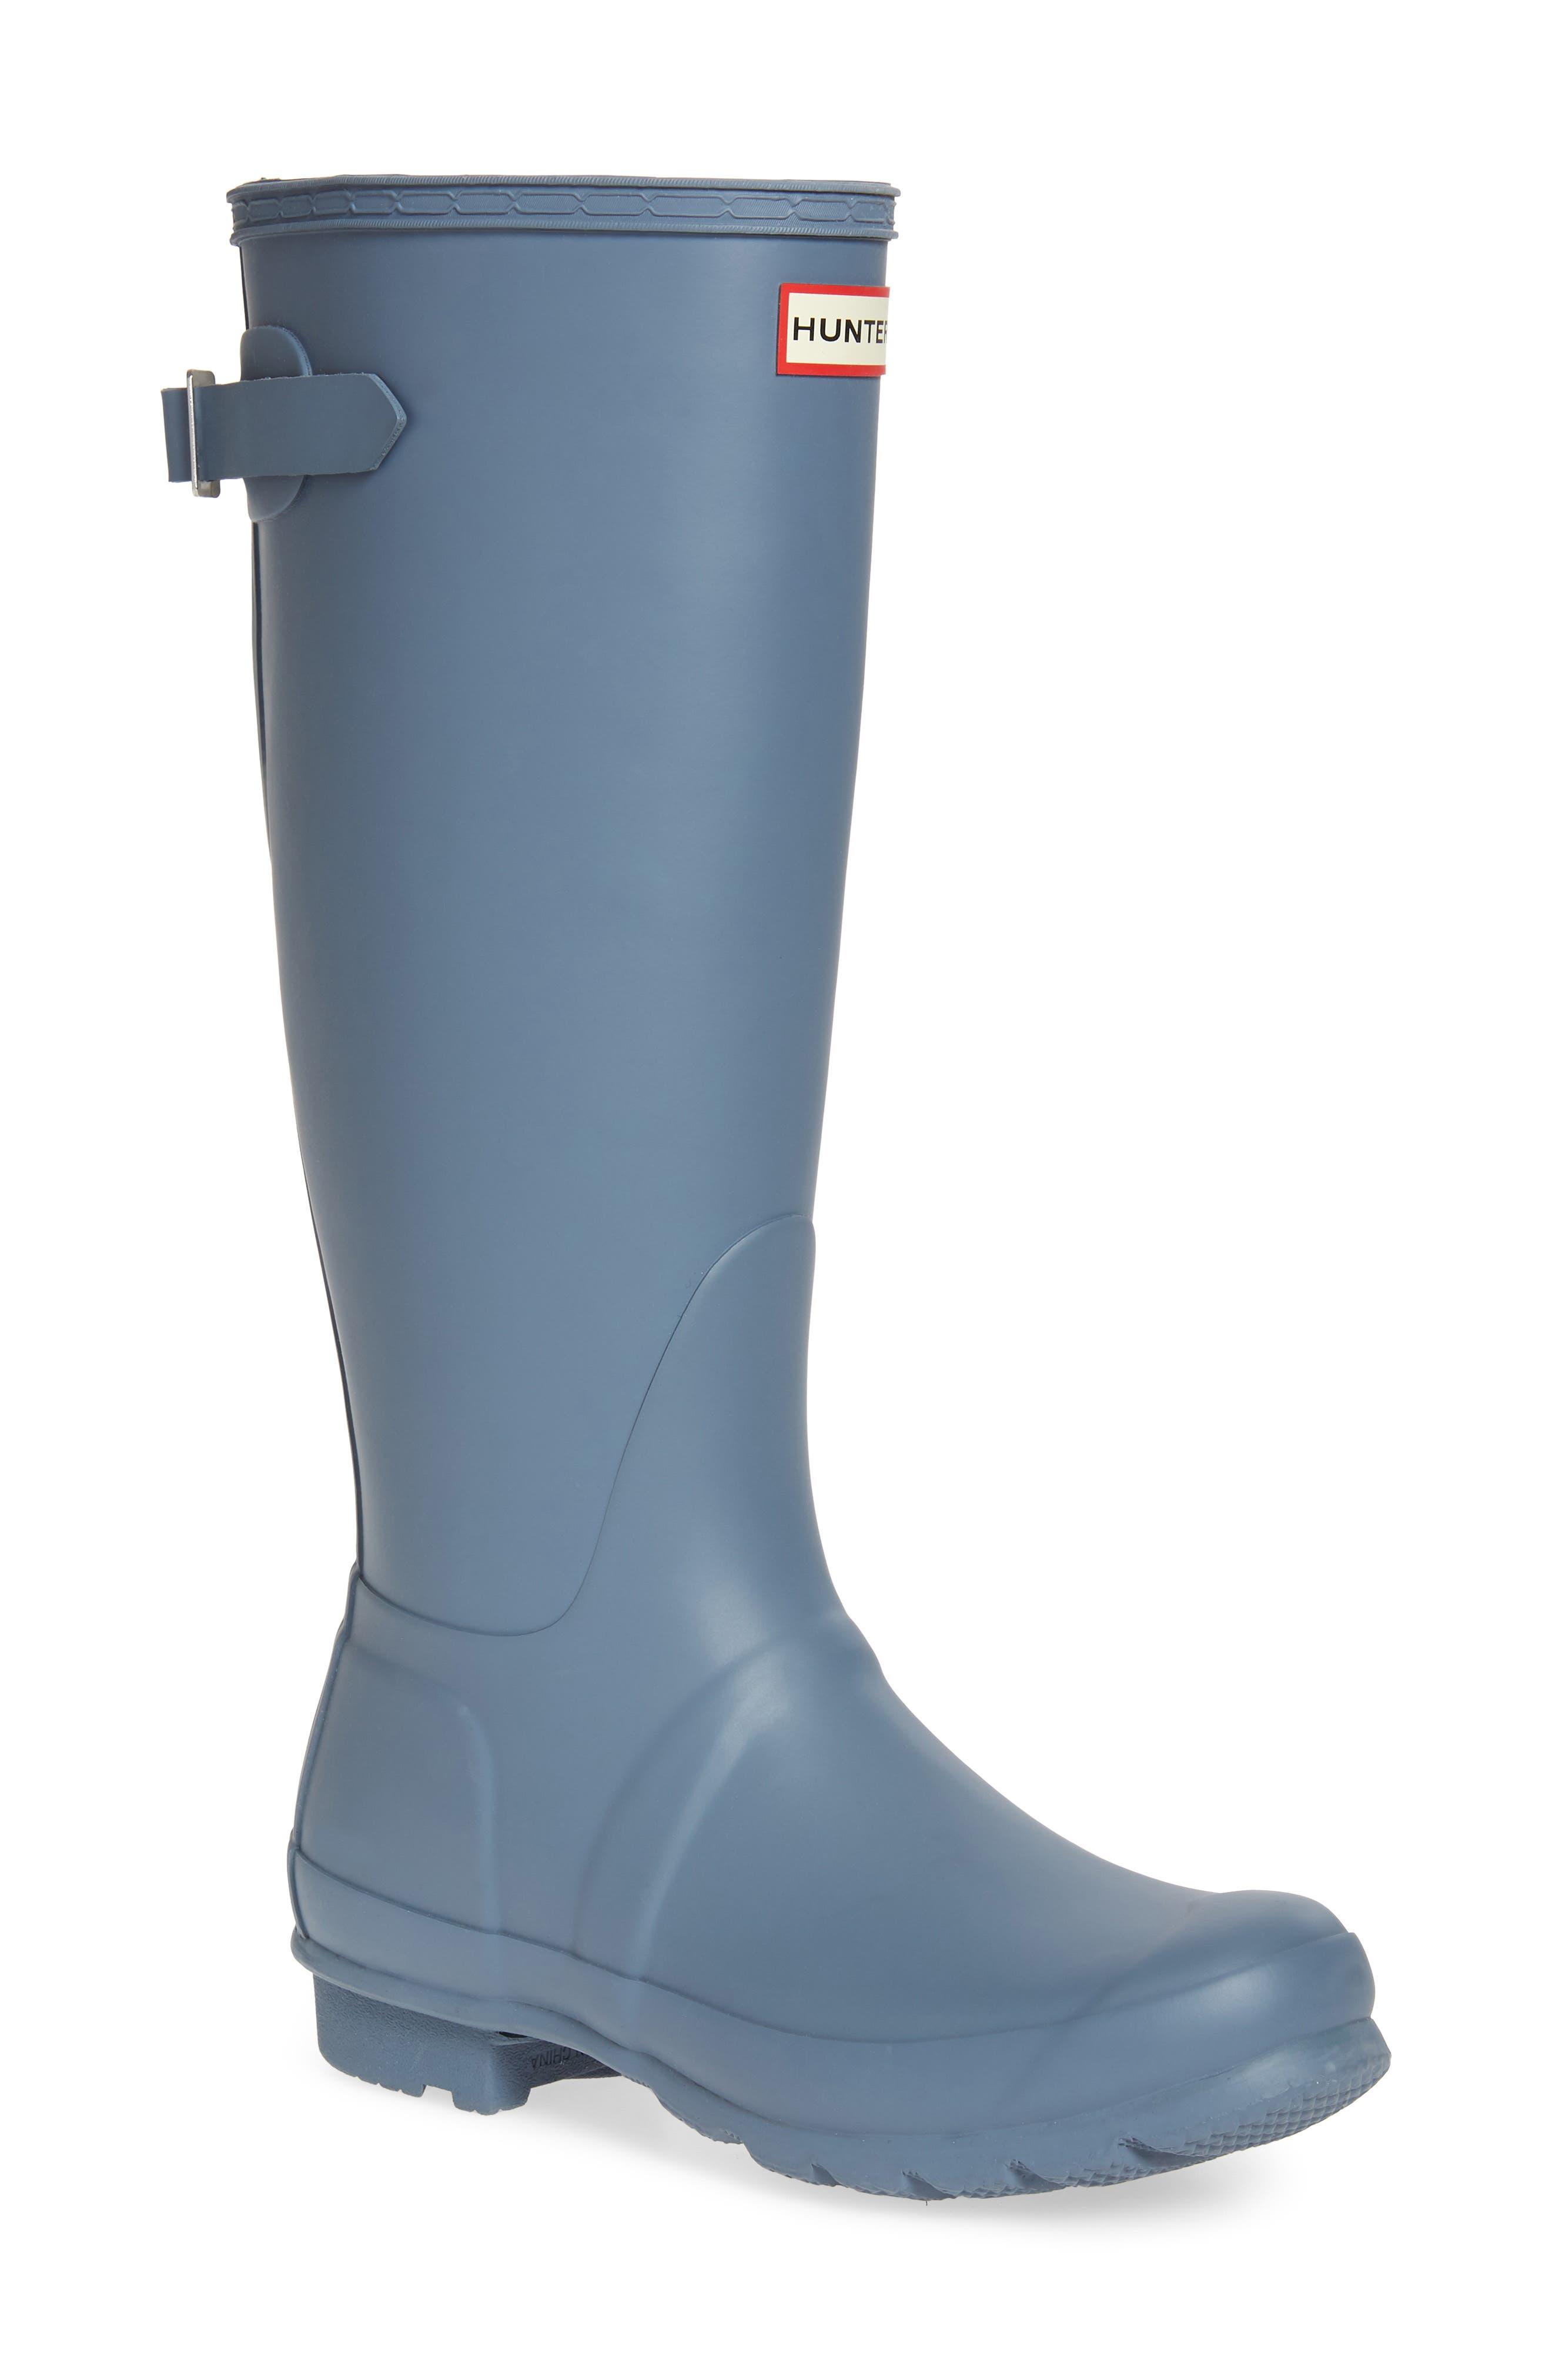 Hunter Original Tall Adjustable Back Waterproof Rain Boot, Grey